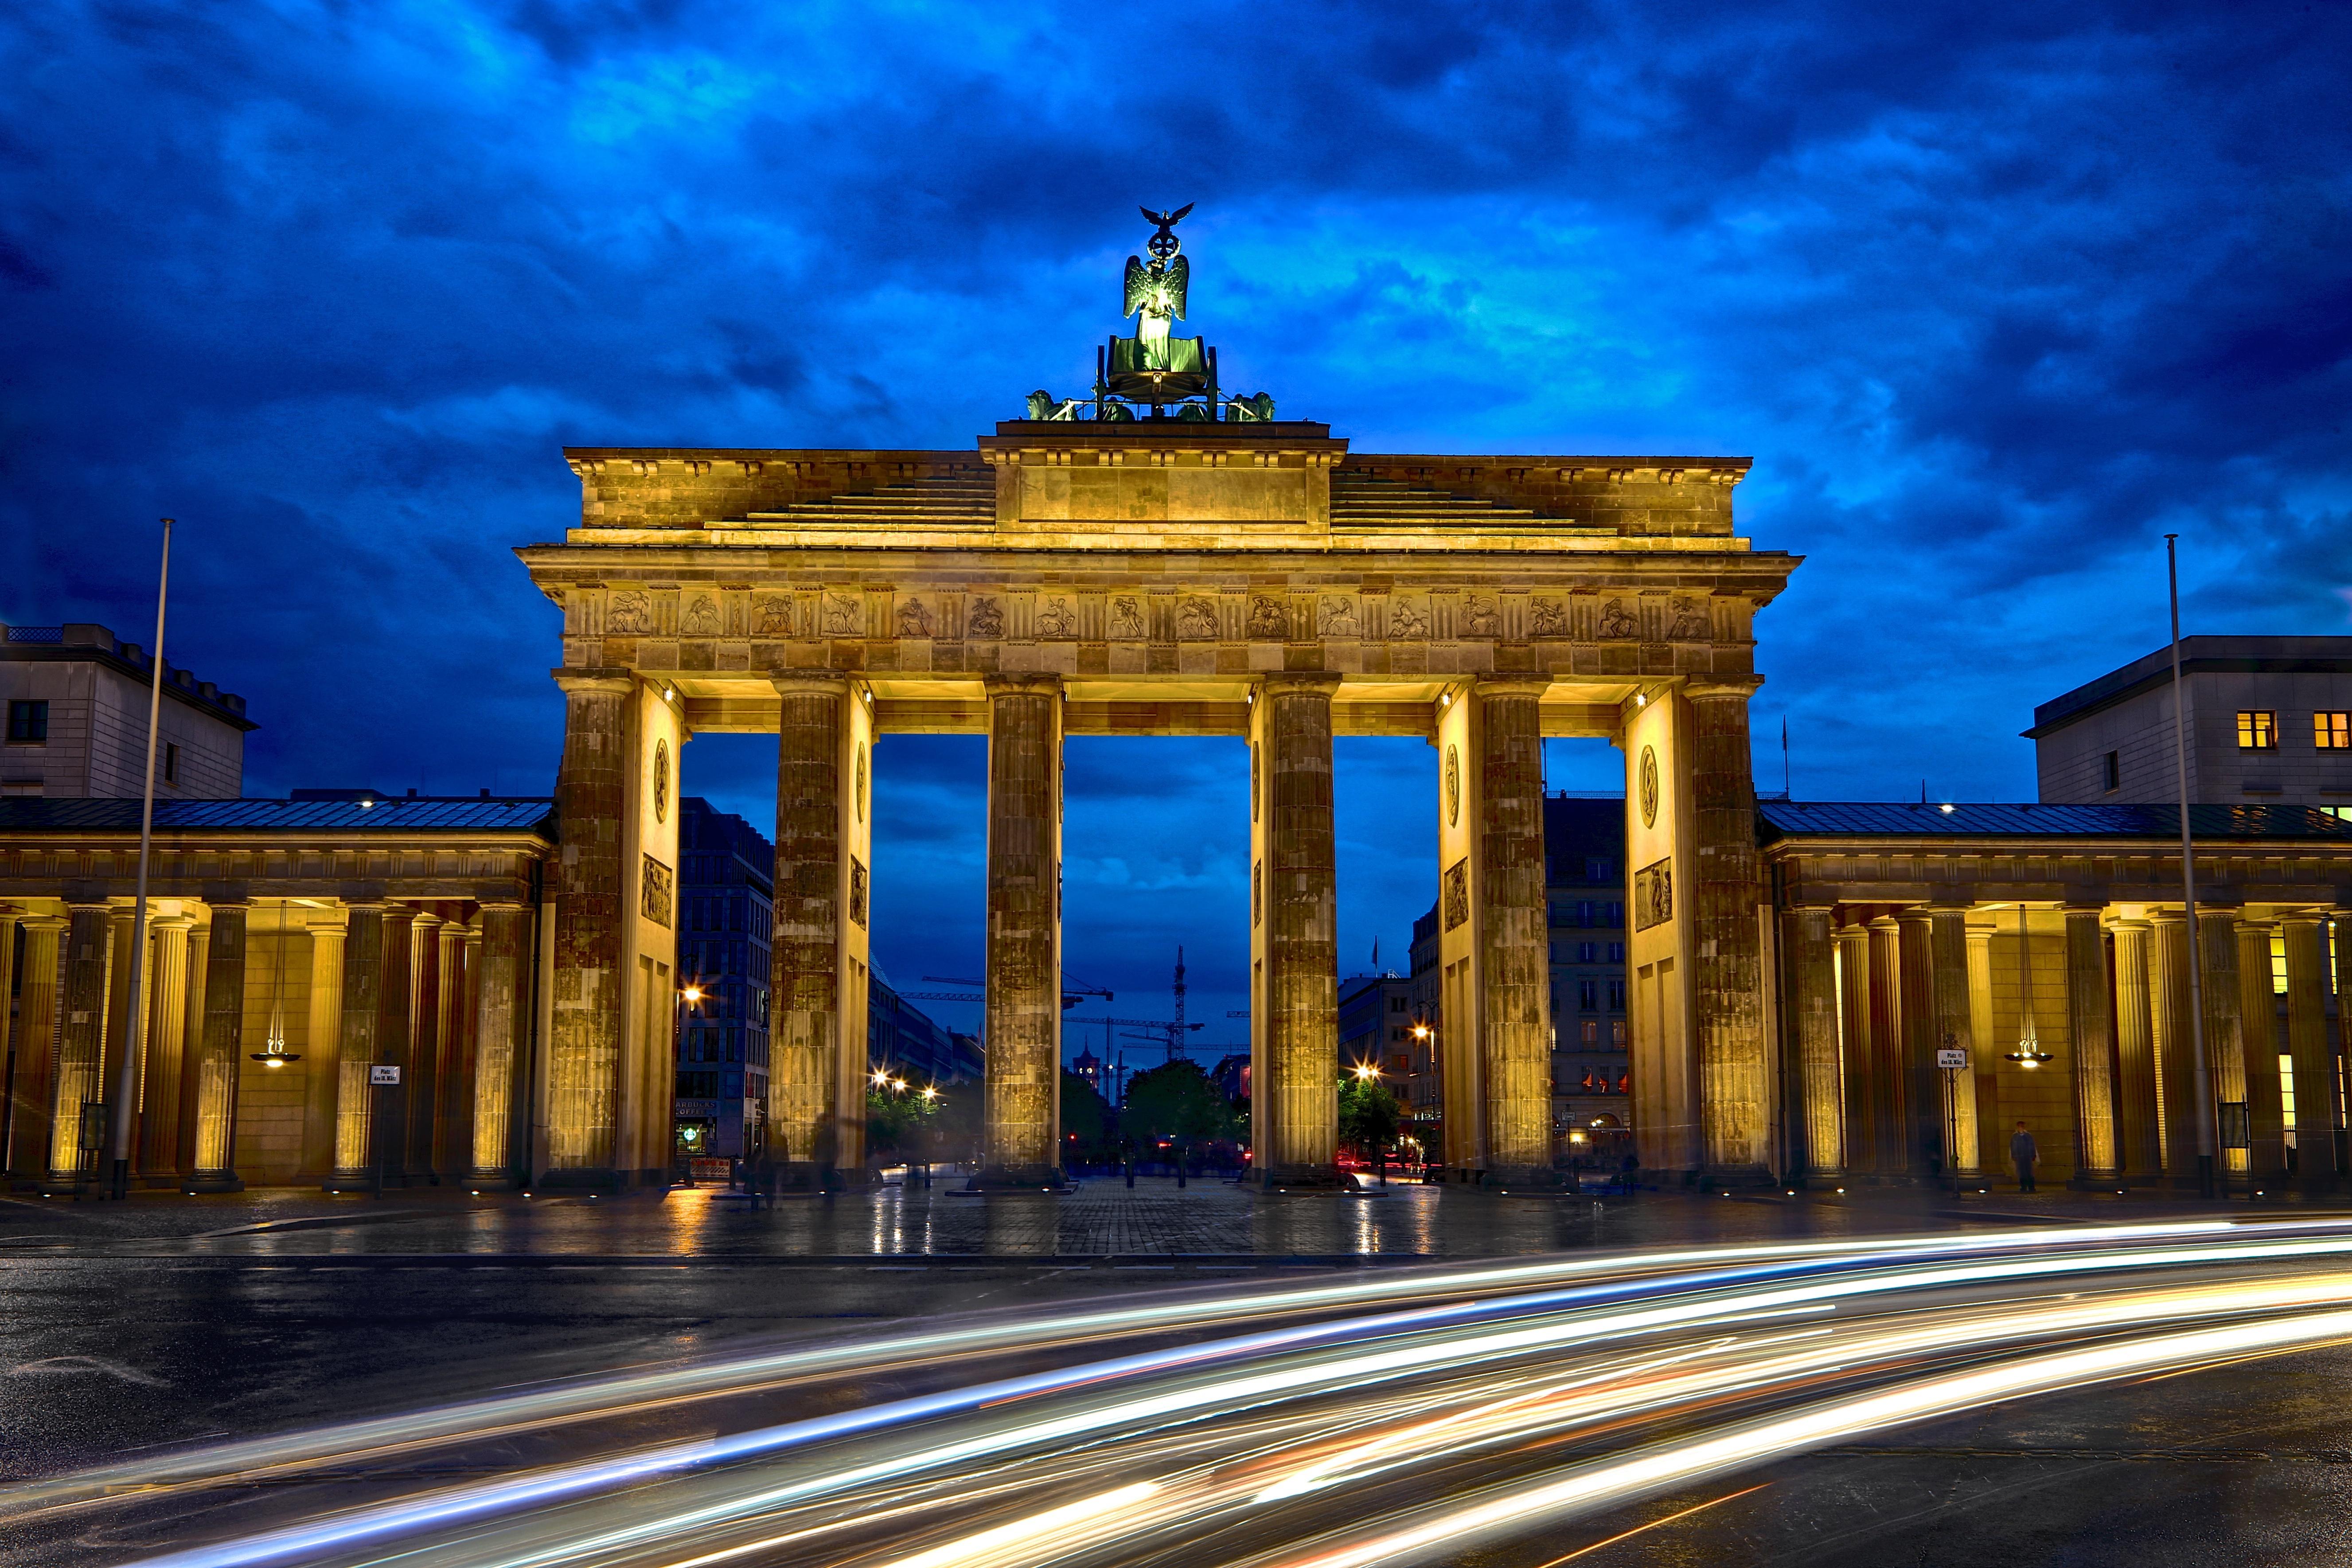 4336 Brandenburg Gate backgrounds hd 2019 5307x3538